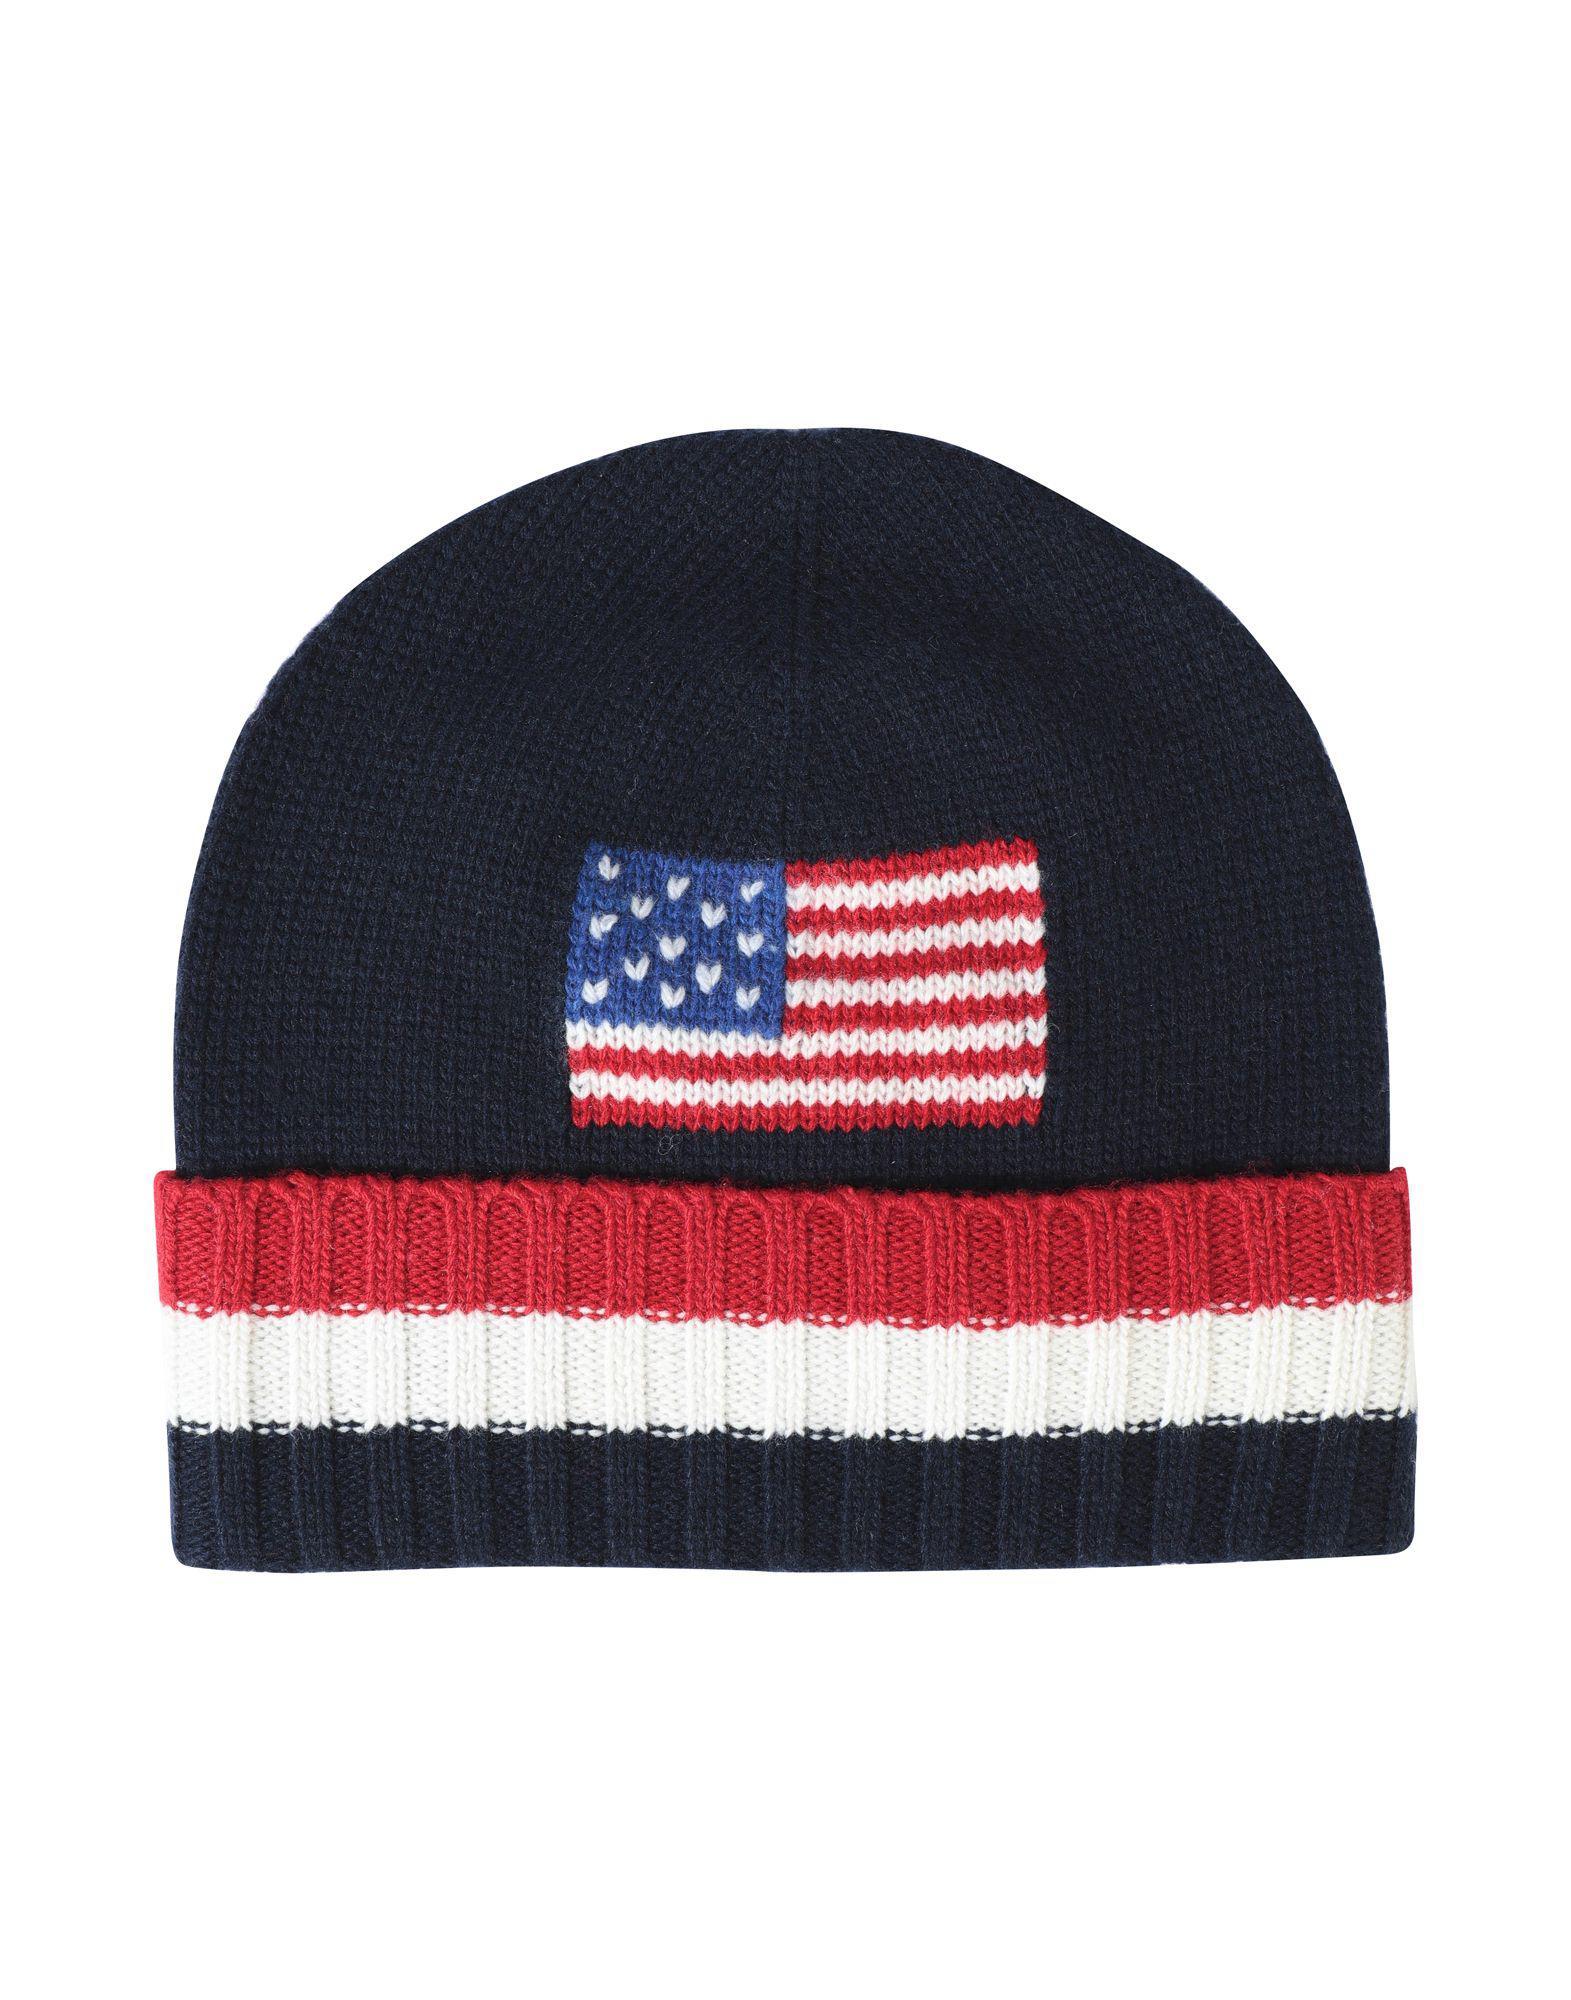 a93eb4b0de3 Polo Ralph Lauren Hat in Blue for Men - Save 2.0% - Lyst